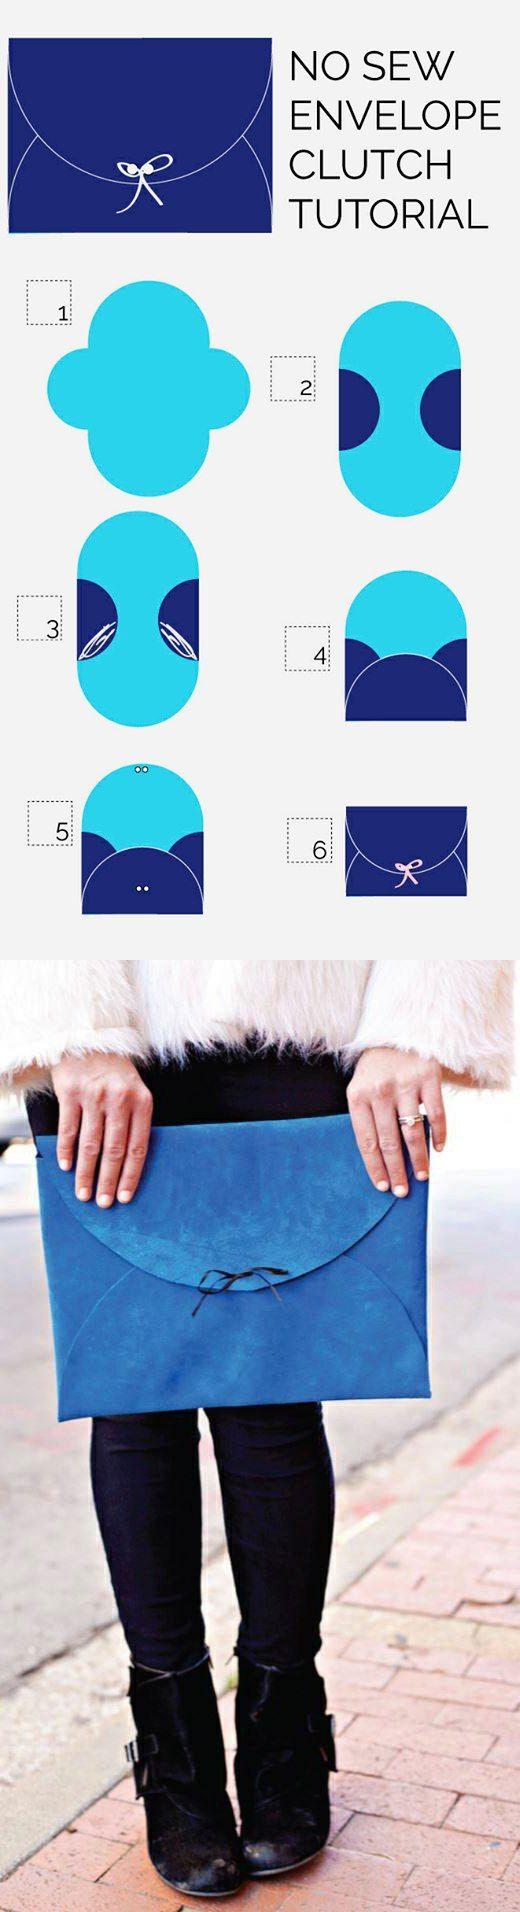 No Sew Envelope Clutch TUTORIAL